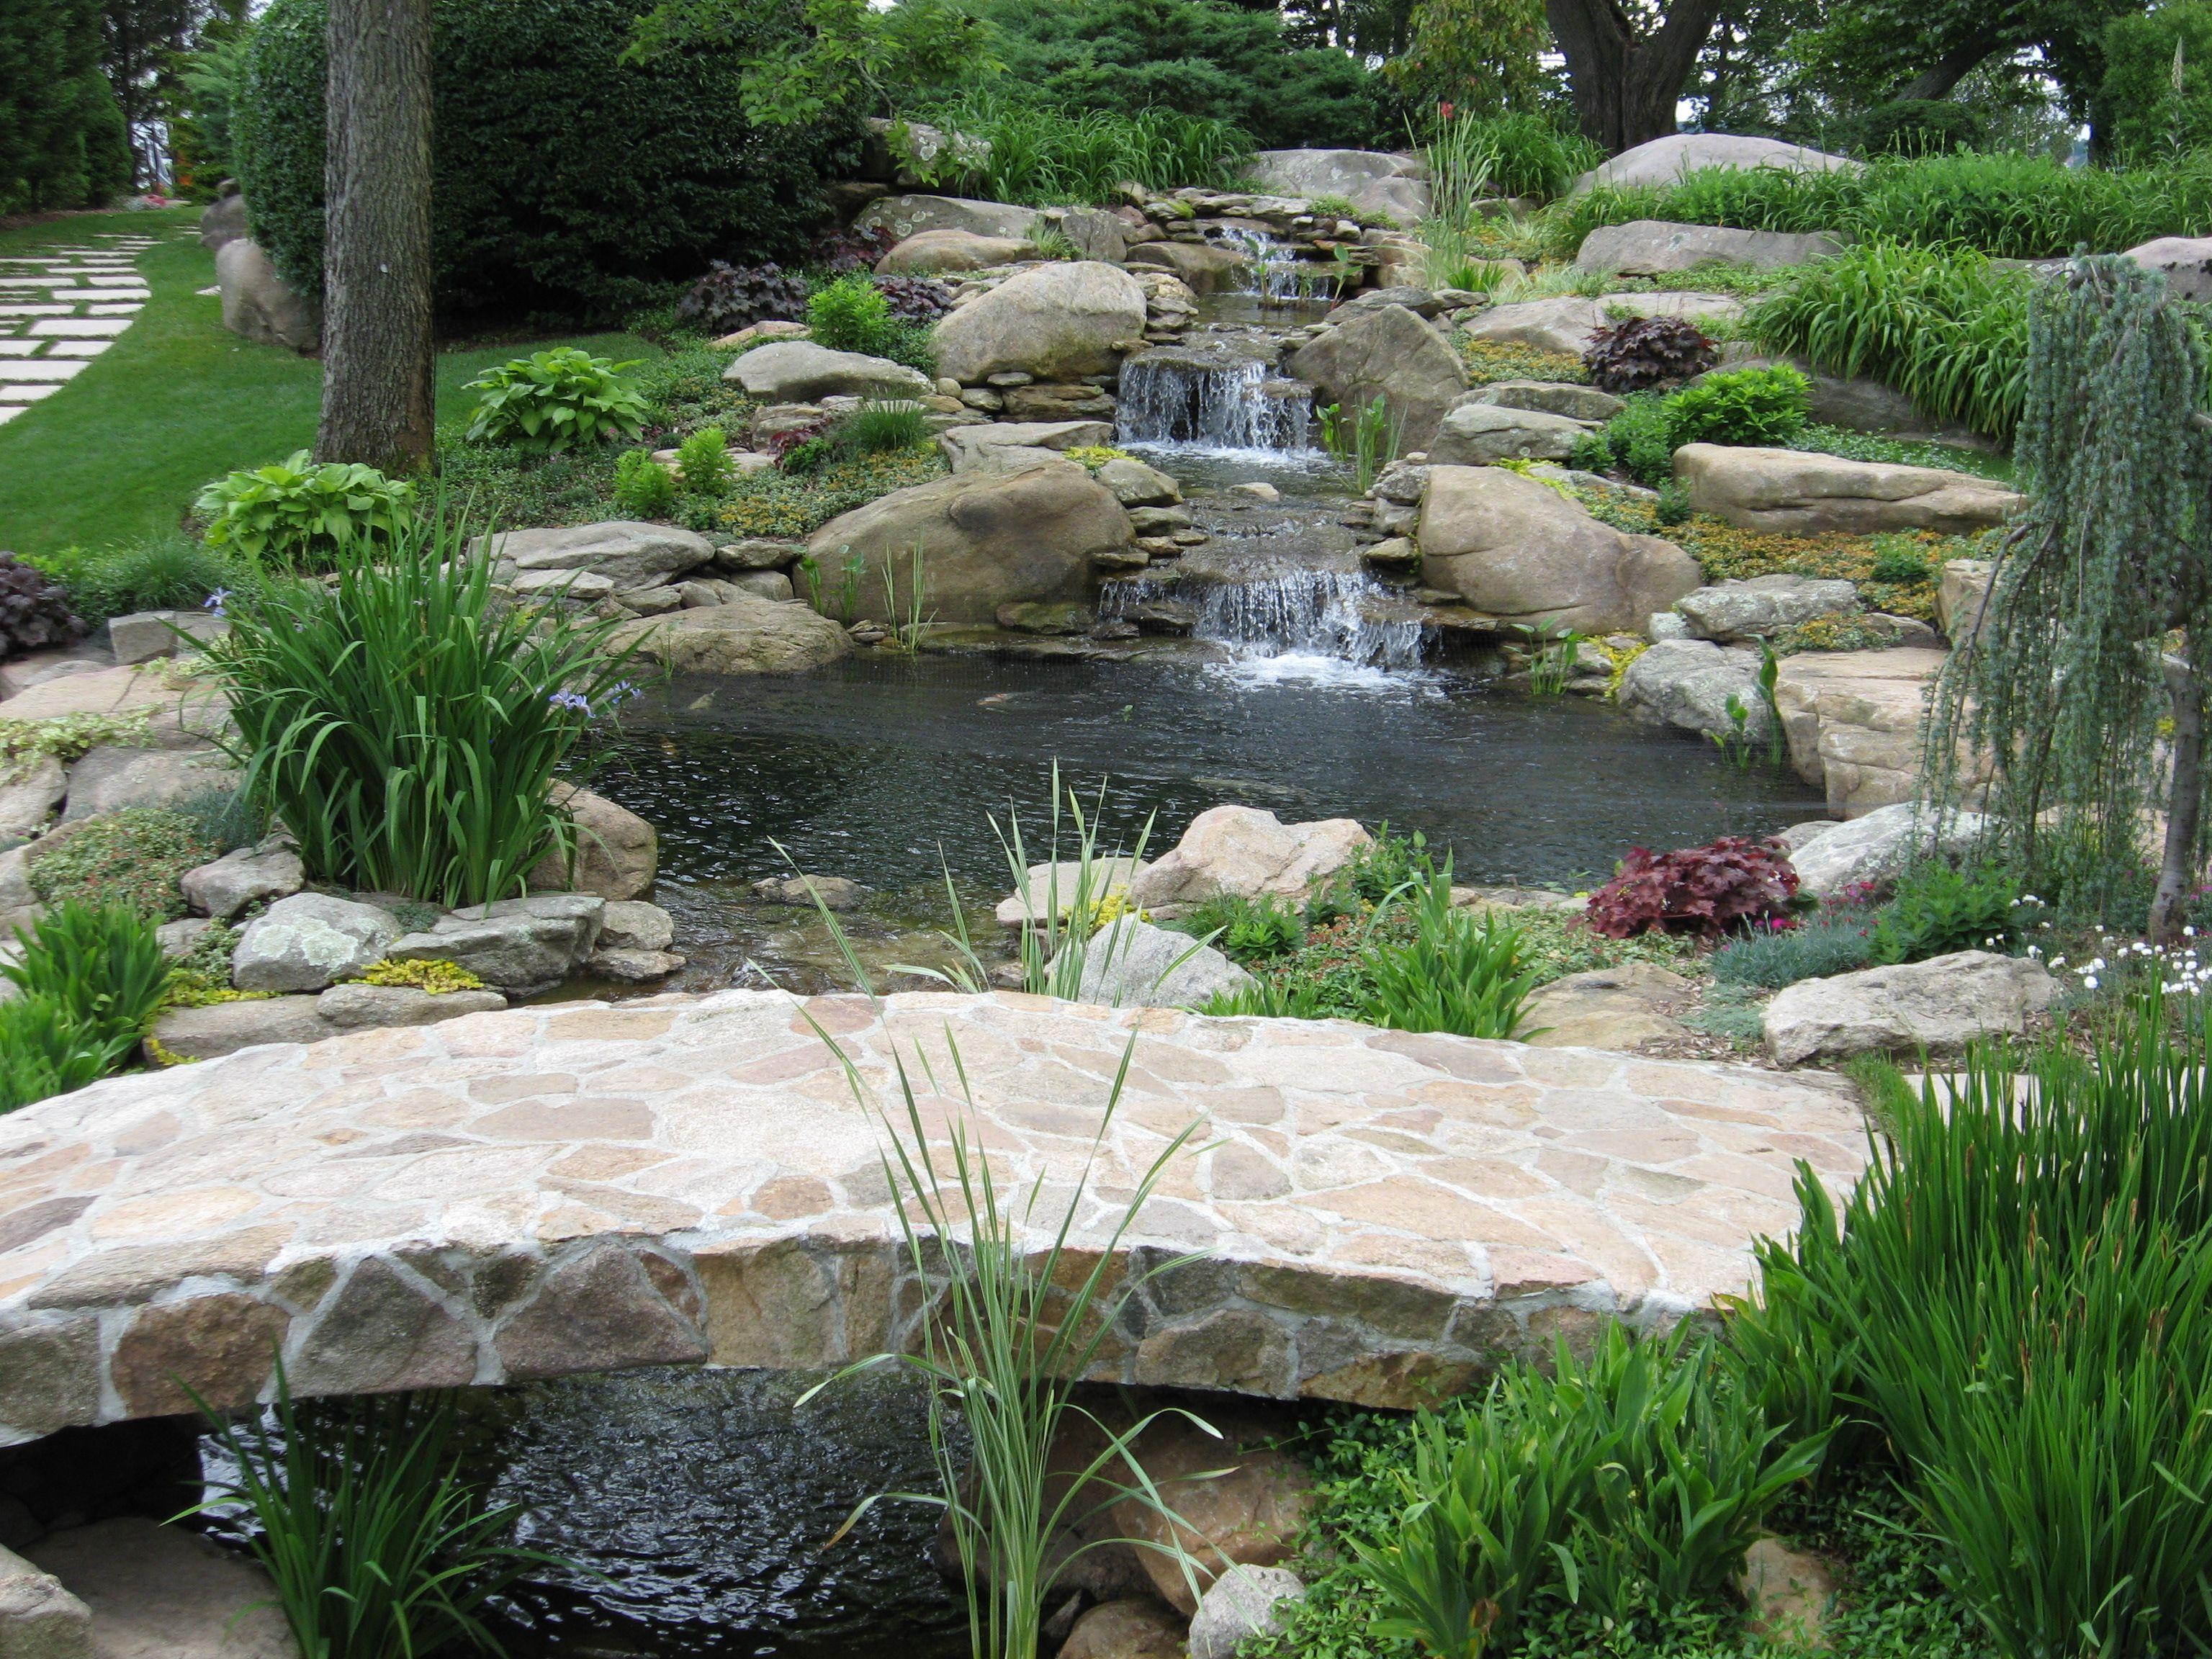 Backyard waterfalls water garden koi pond and streams with stone